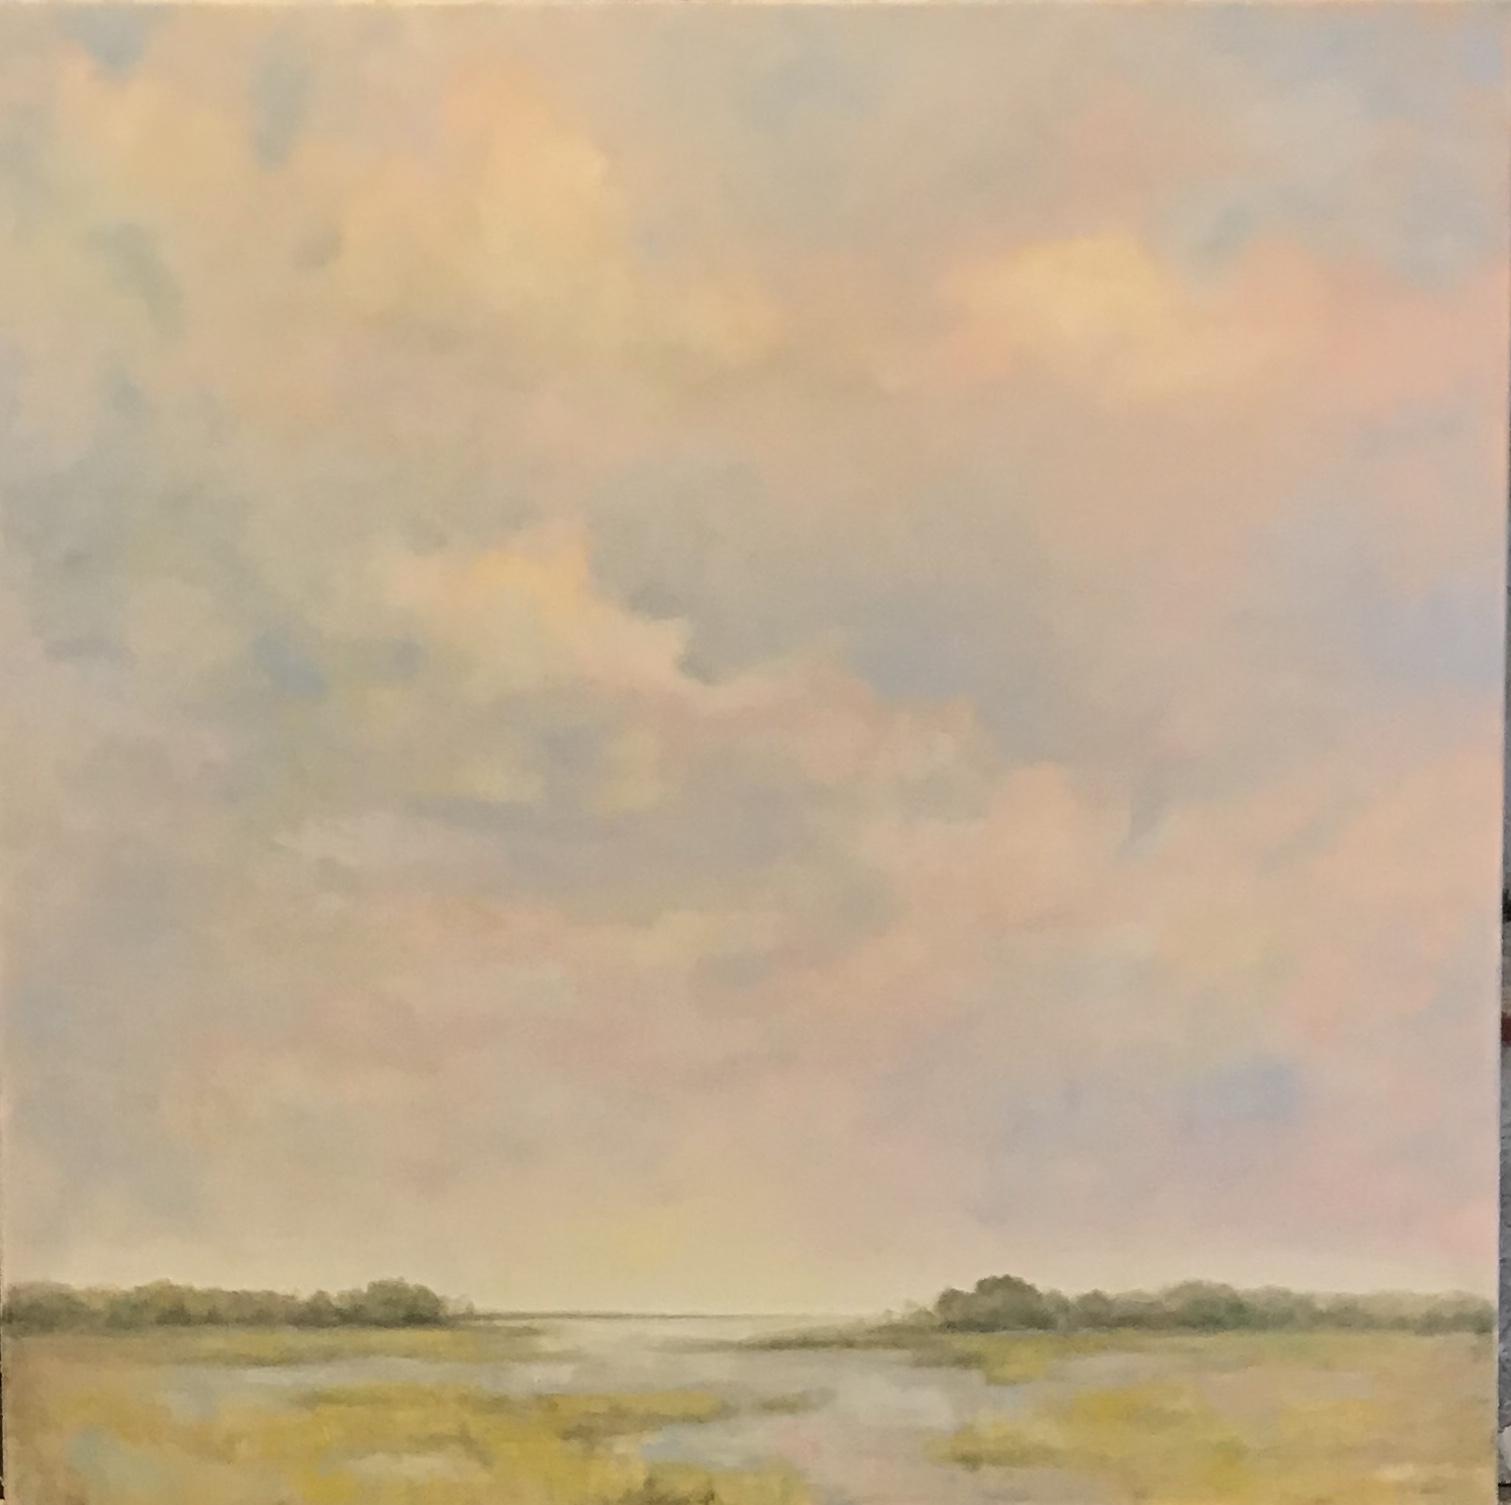 Marsh Grass and Pink Sky